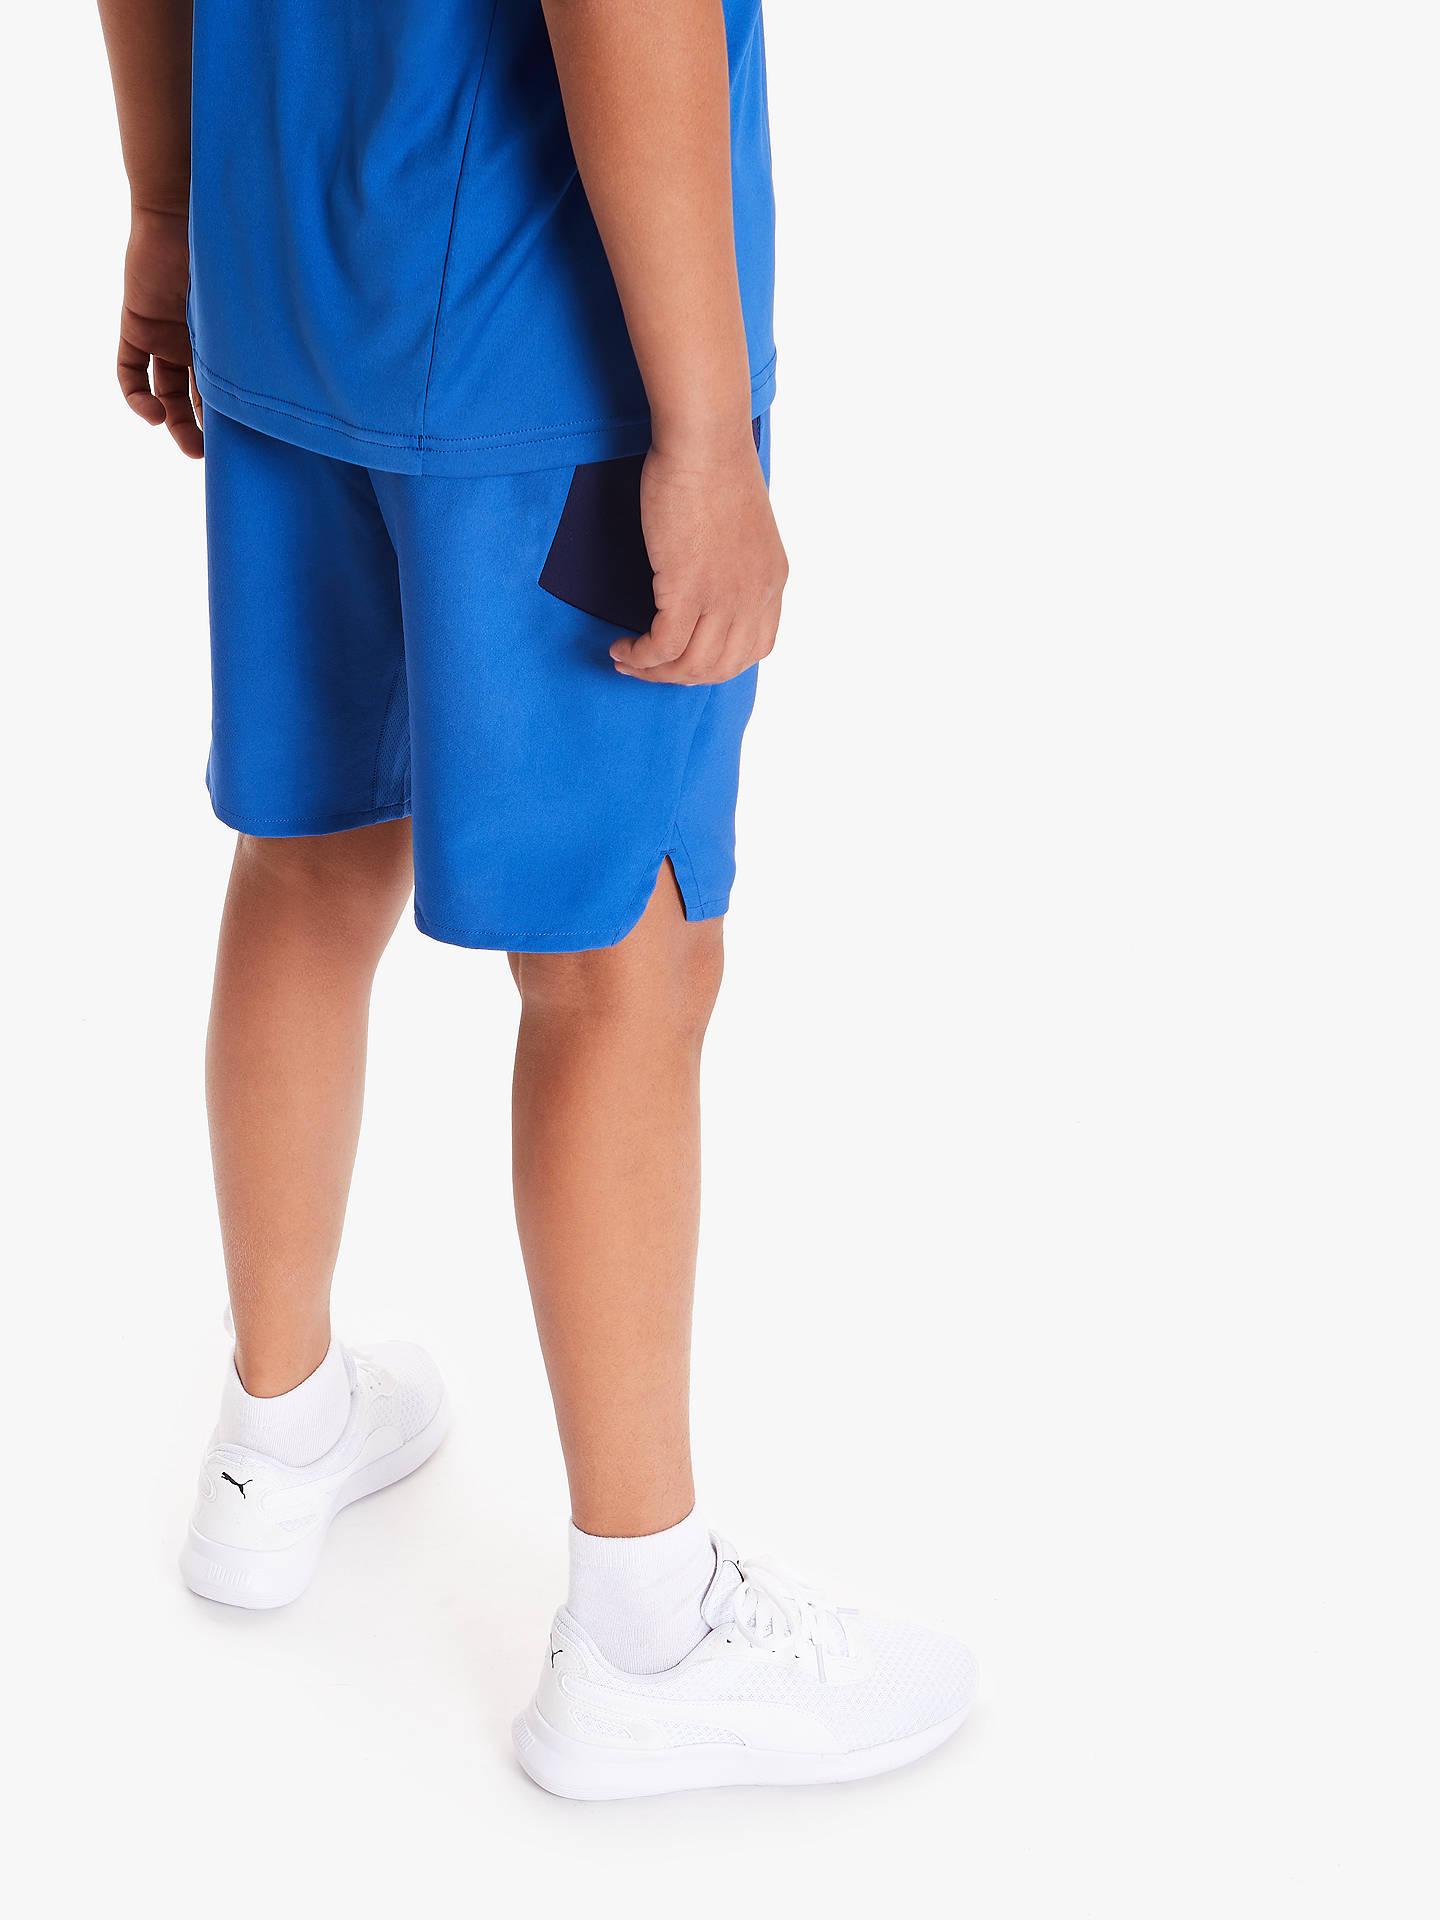 PUMA Boys' Active Sports Shorts, Galaxy Blue at John Lewis & Partners